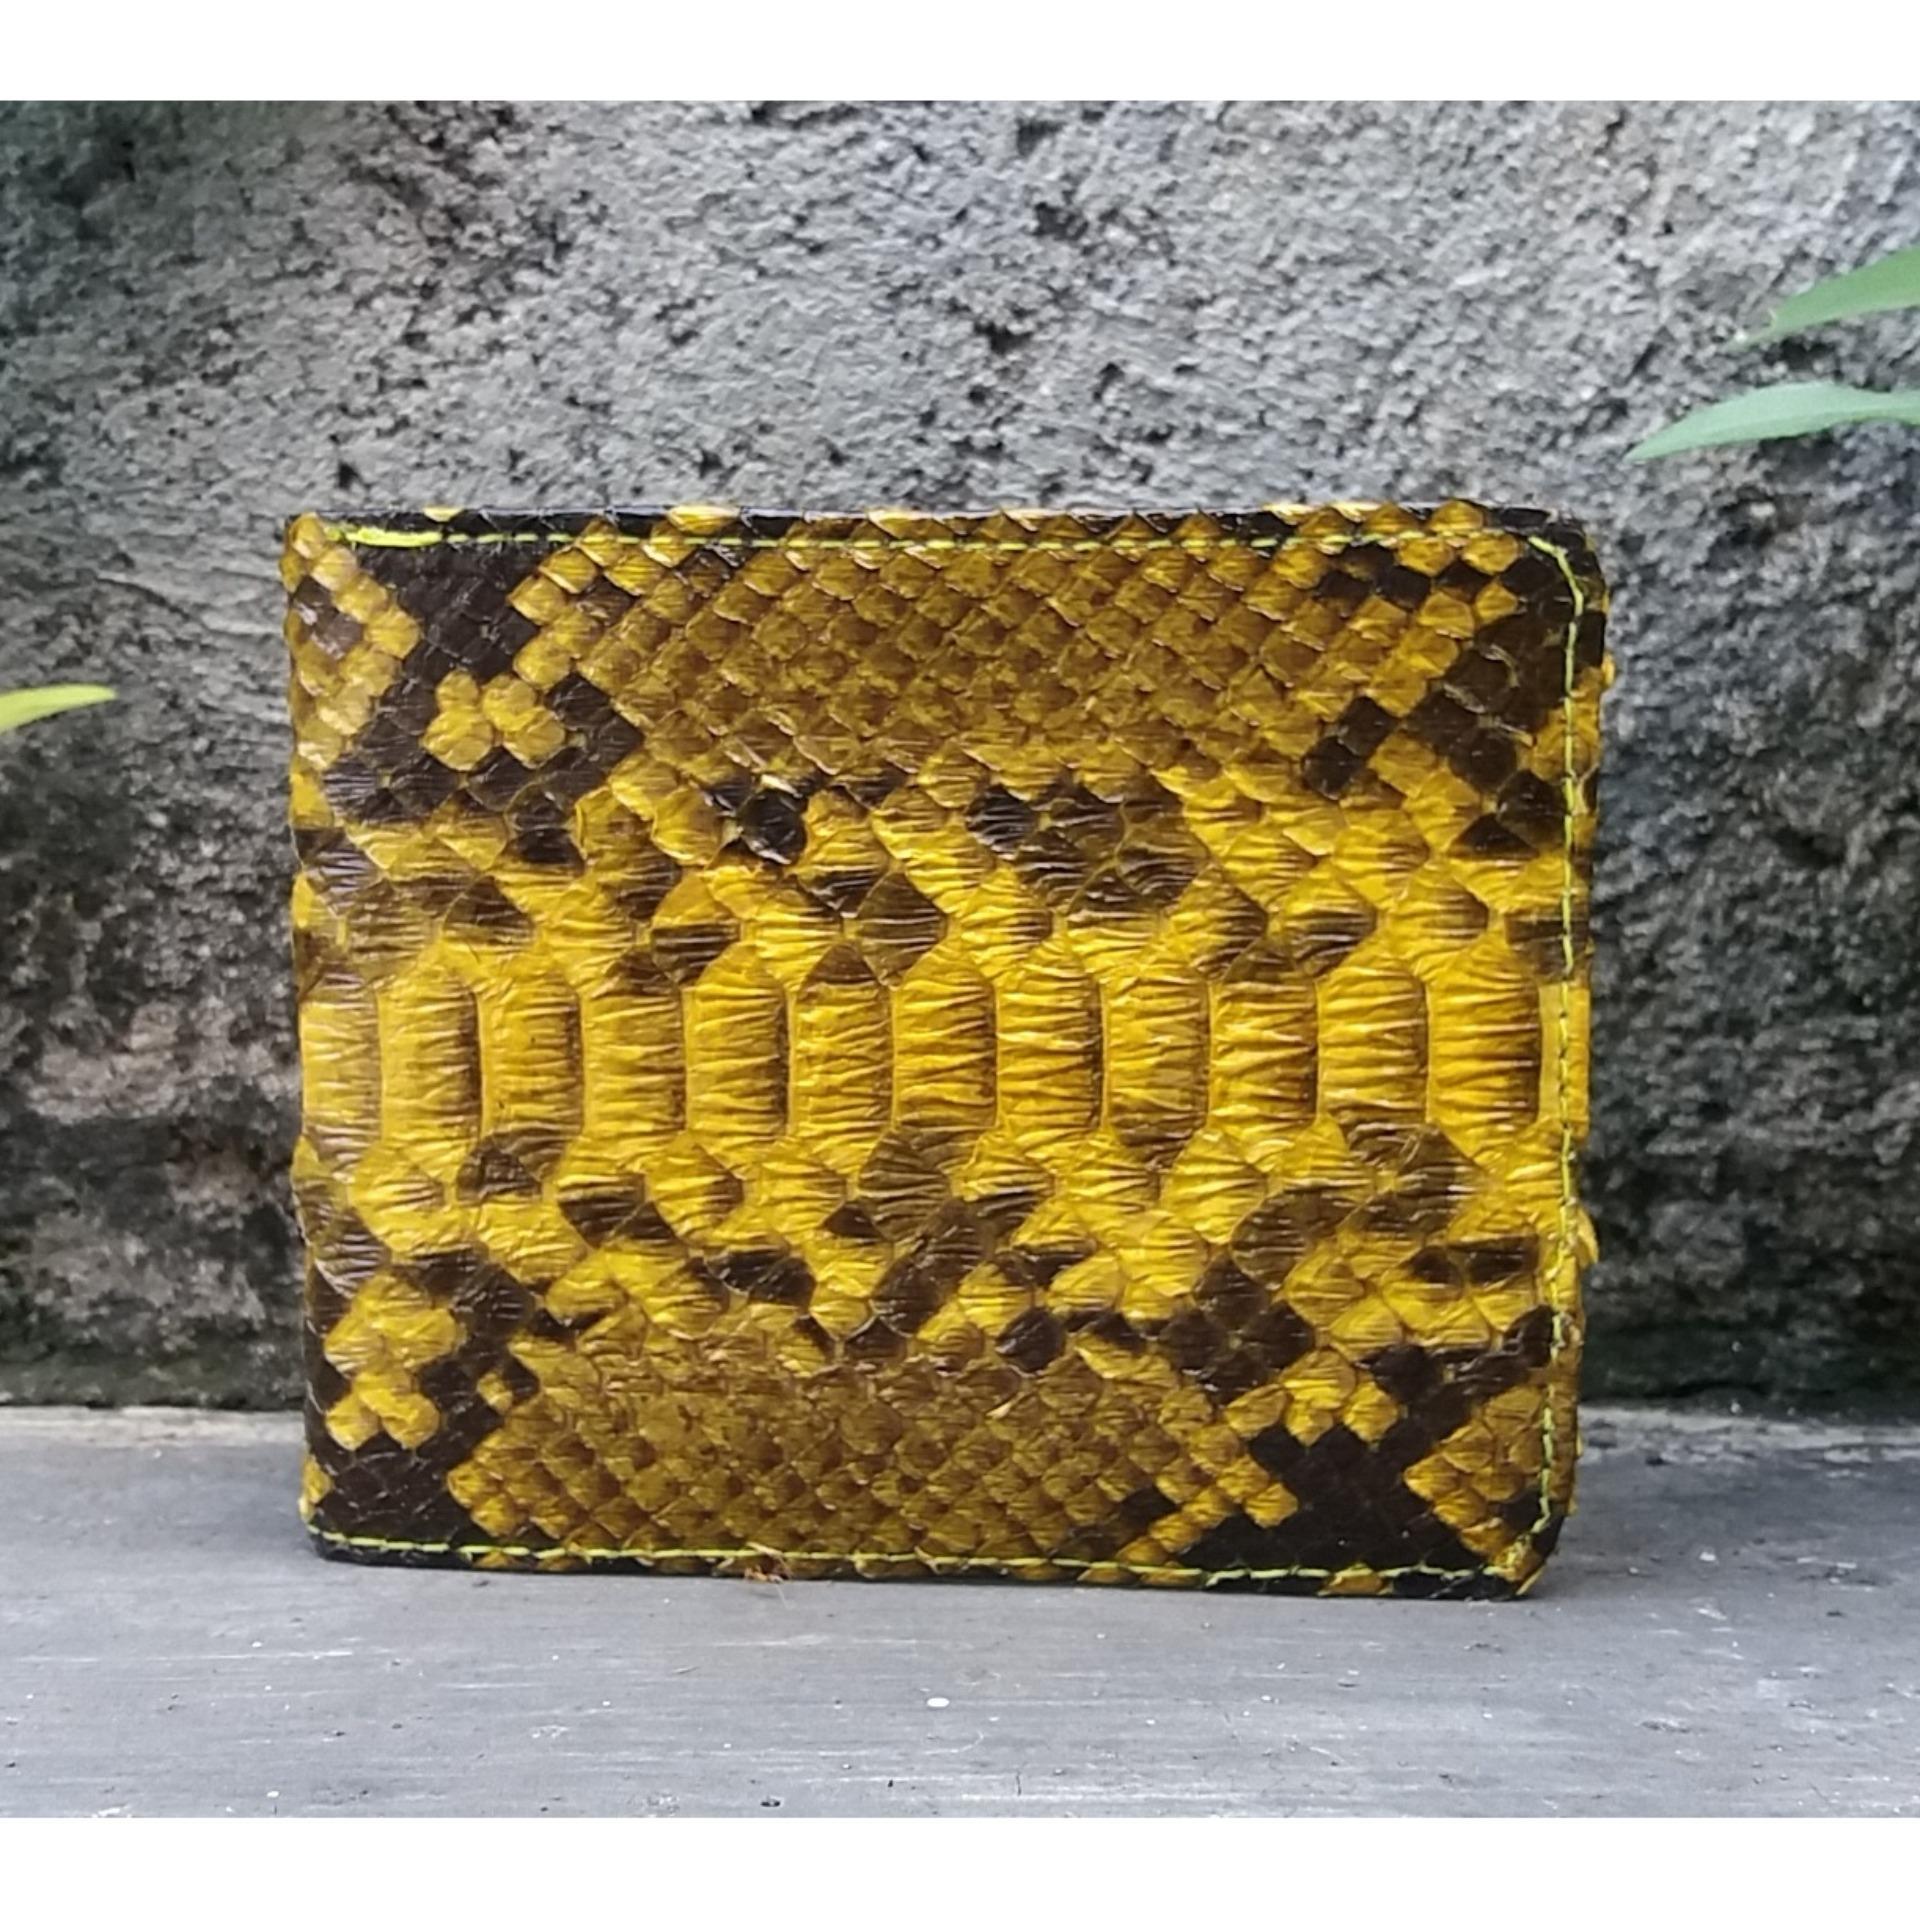 Harga Jual Dompet Pria Asli Kulit Ular Phyton Sanca Model Bifold Wallet Mens Import Branded  Ragazzo Dkr 006